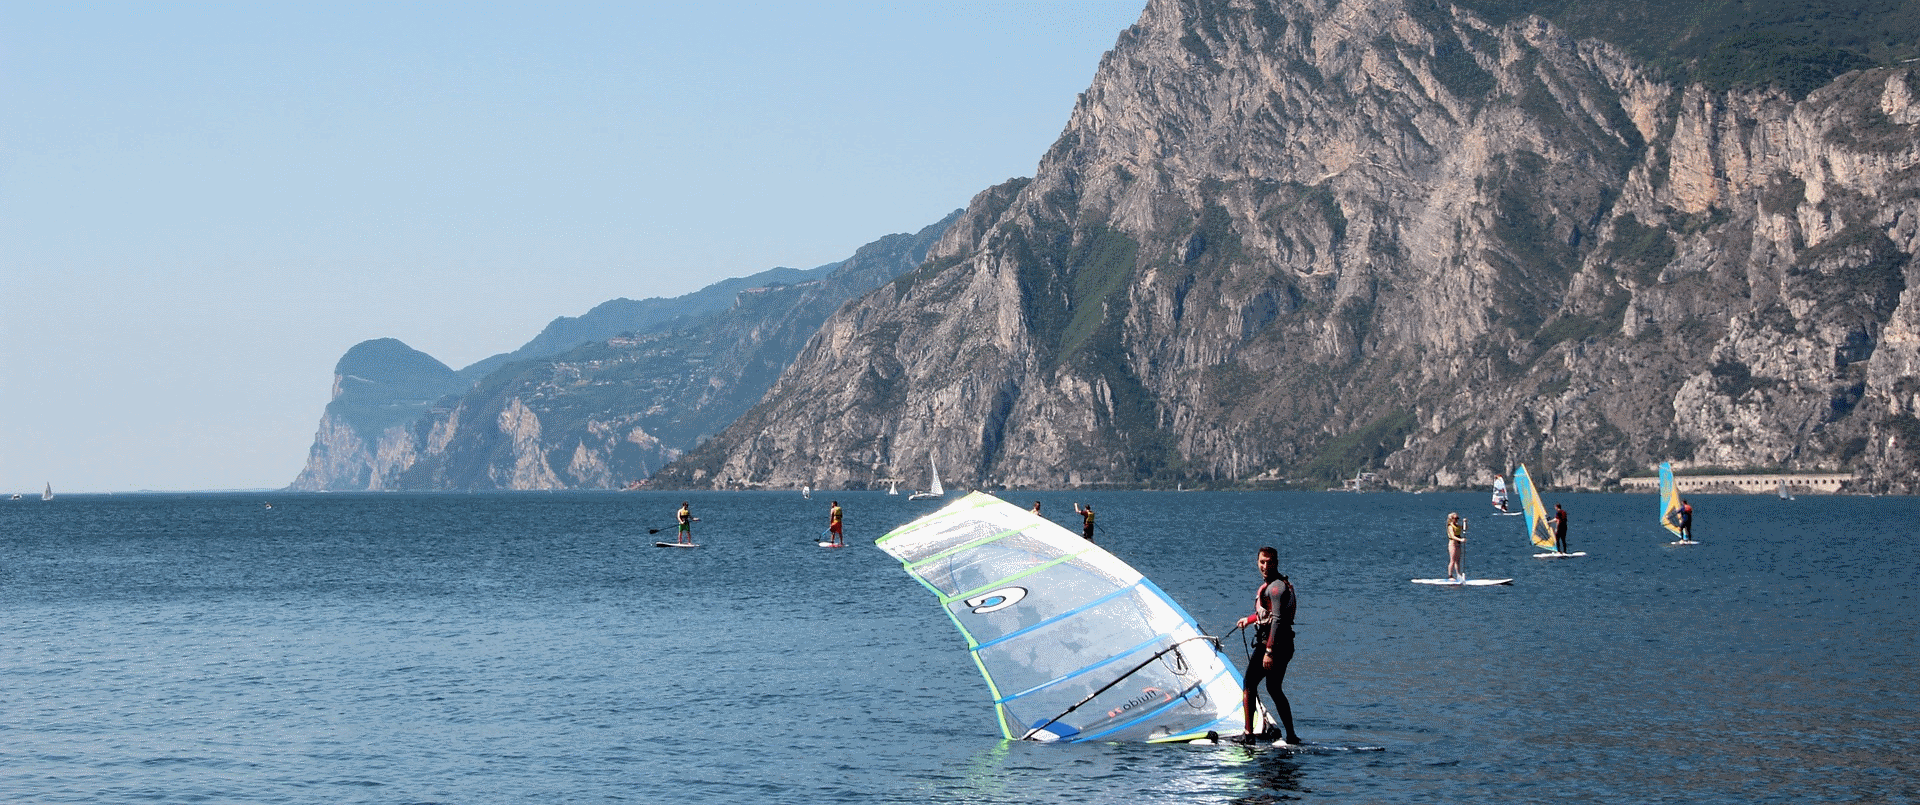 KITE E WIND SURF